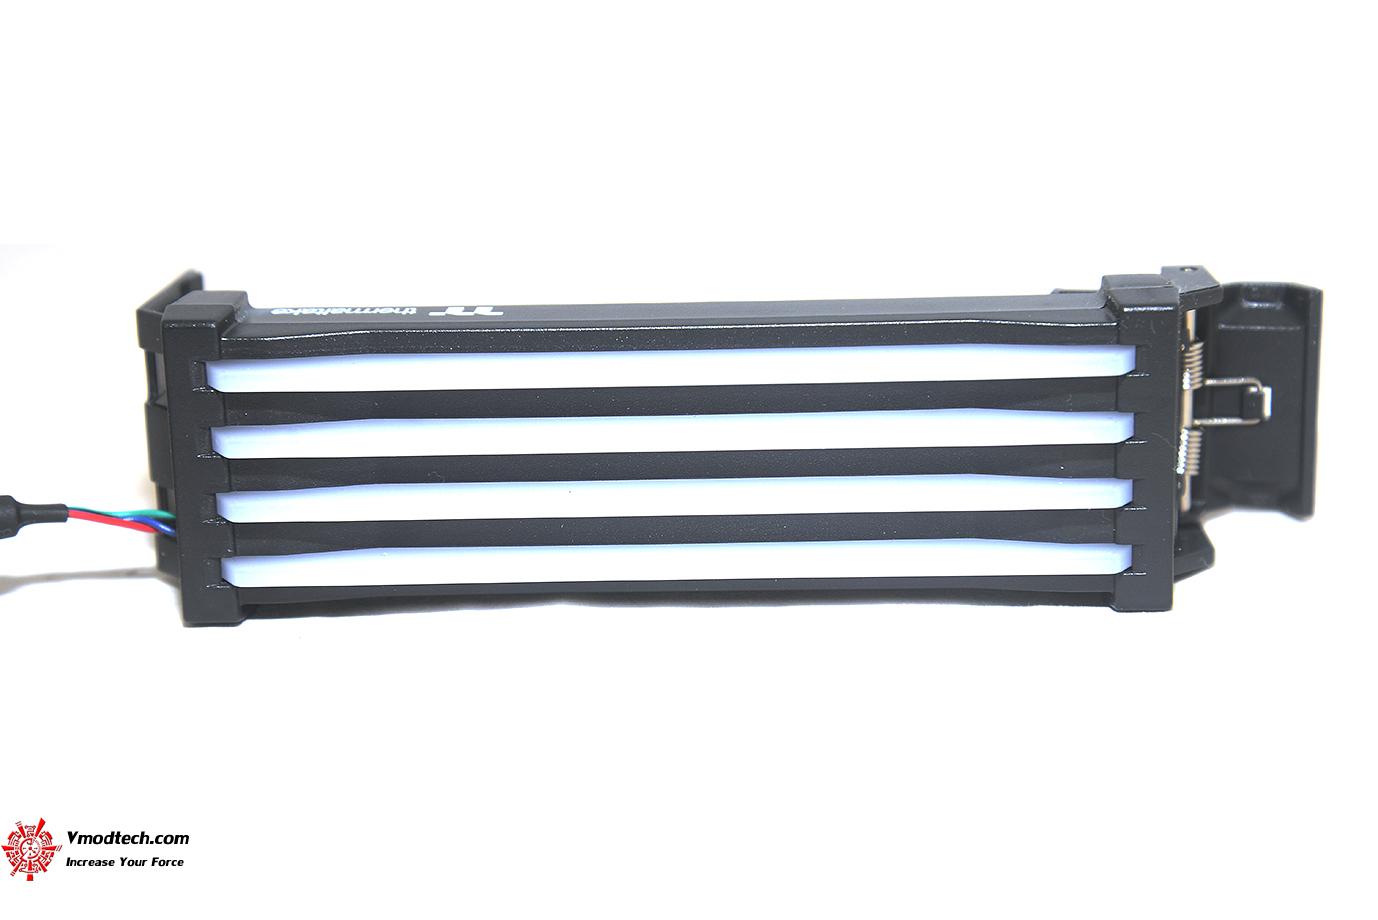 dsc 5511 Thermaltake Pacific R1 Plus DDR4 Memory Lighting Kit Review